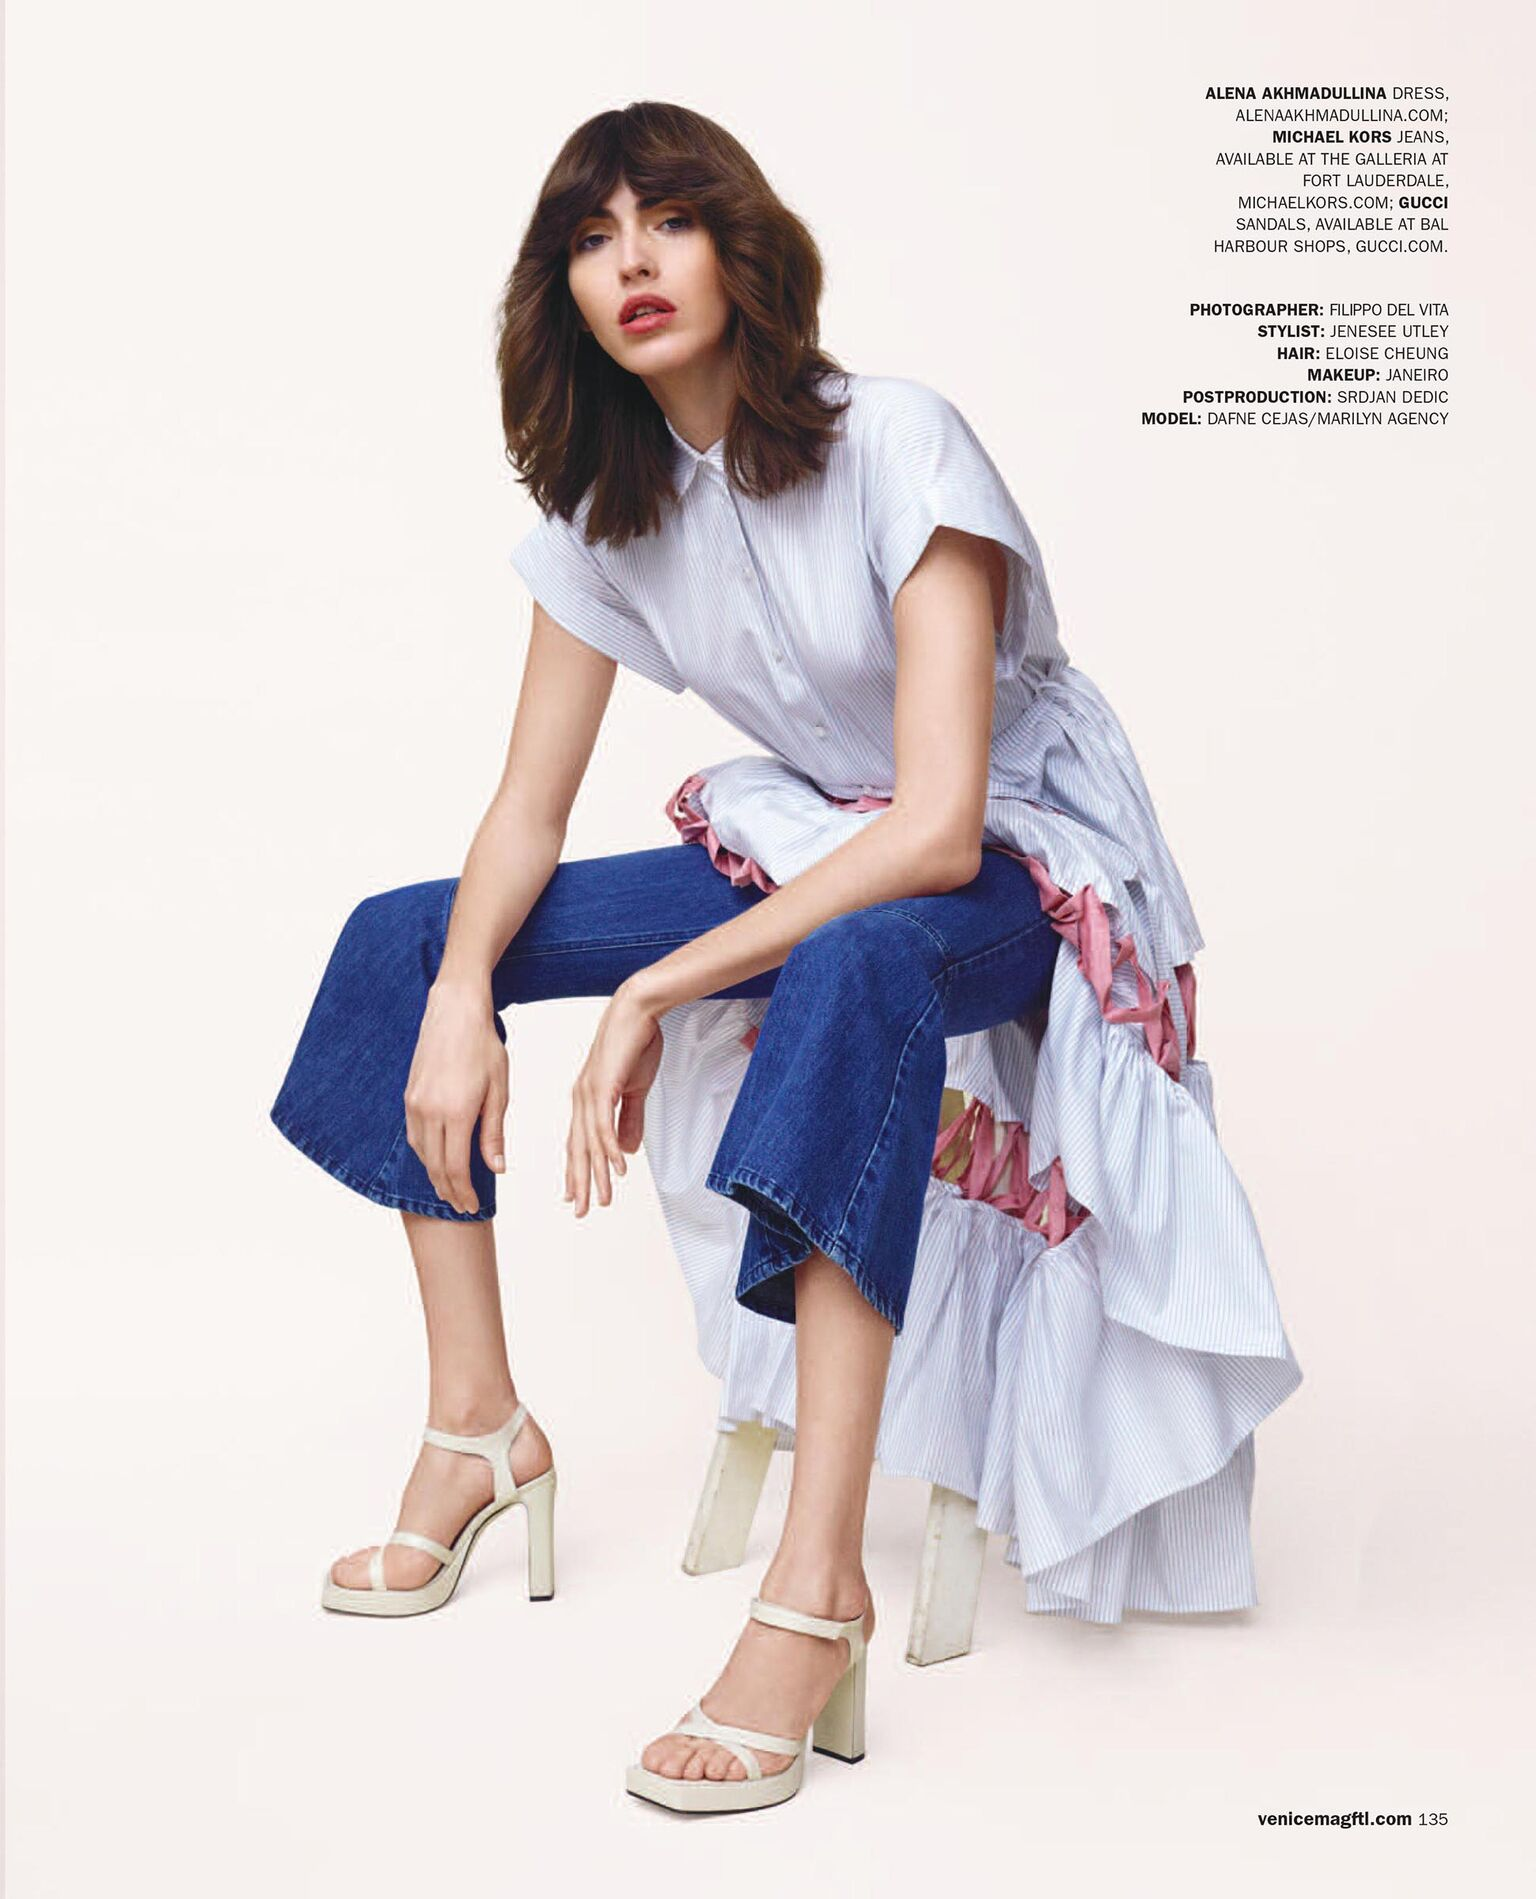 SS18 Venice Magazine AA.jpg